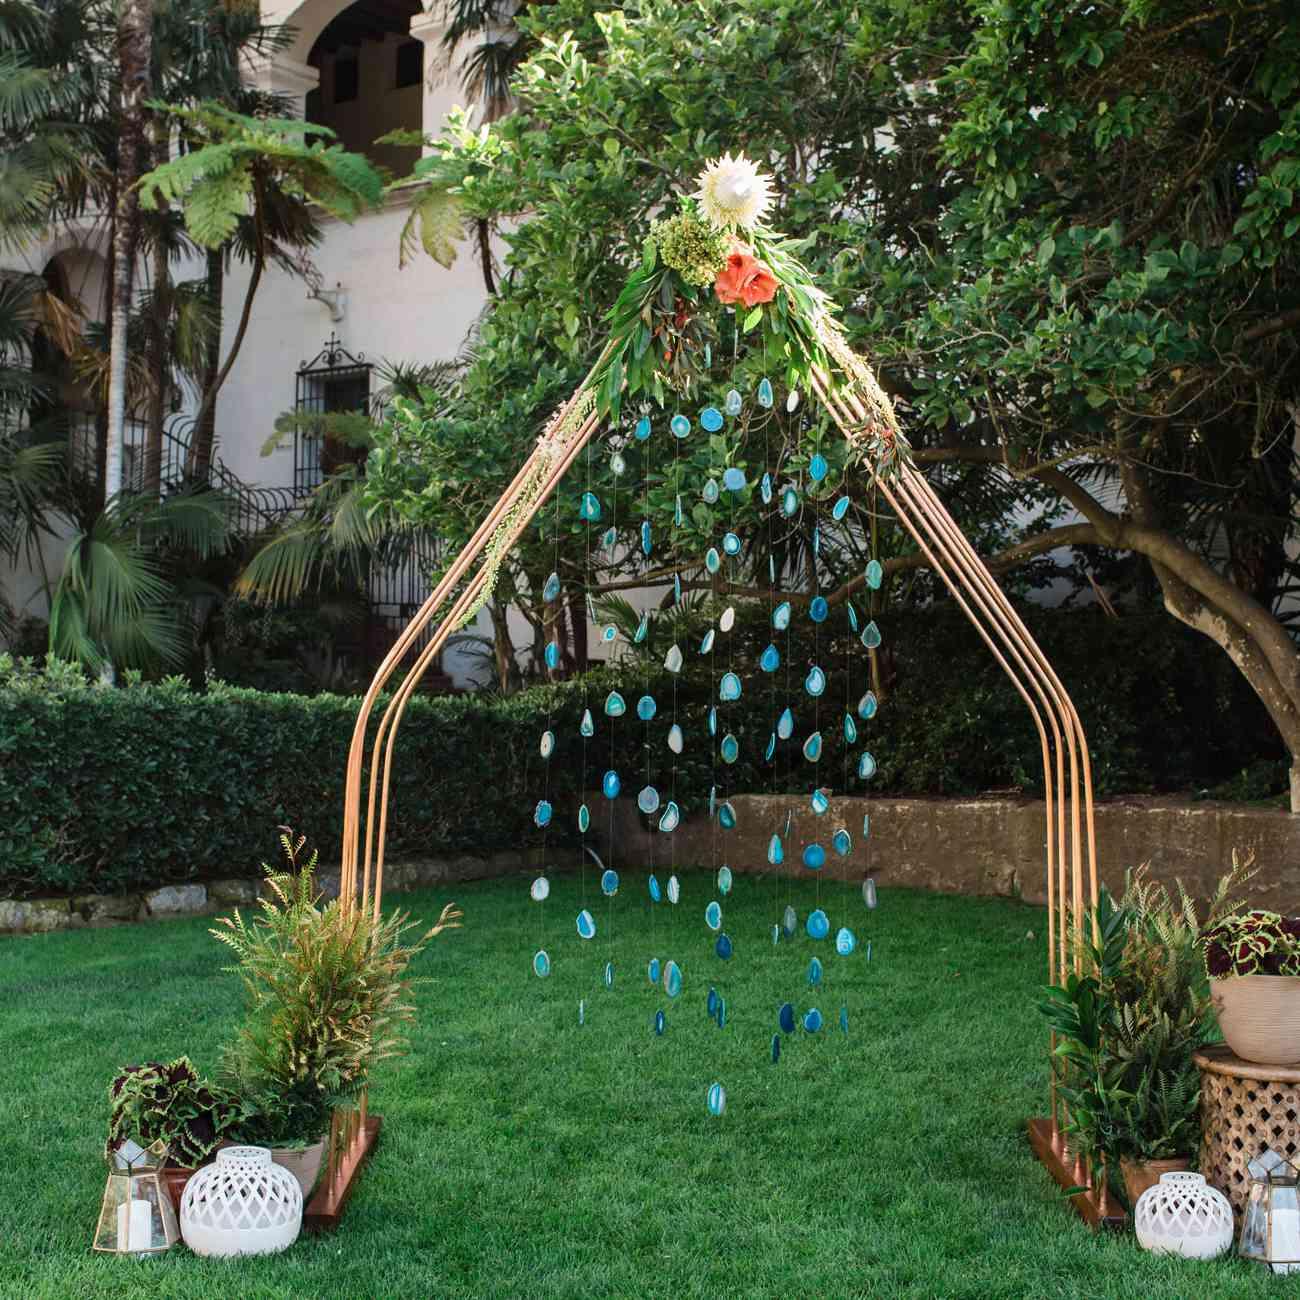 Hanging crystals on triangular shaped altar